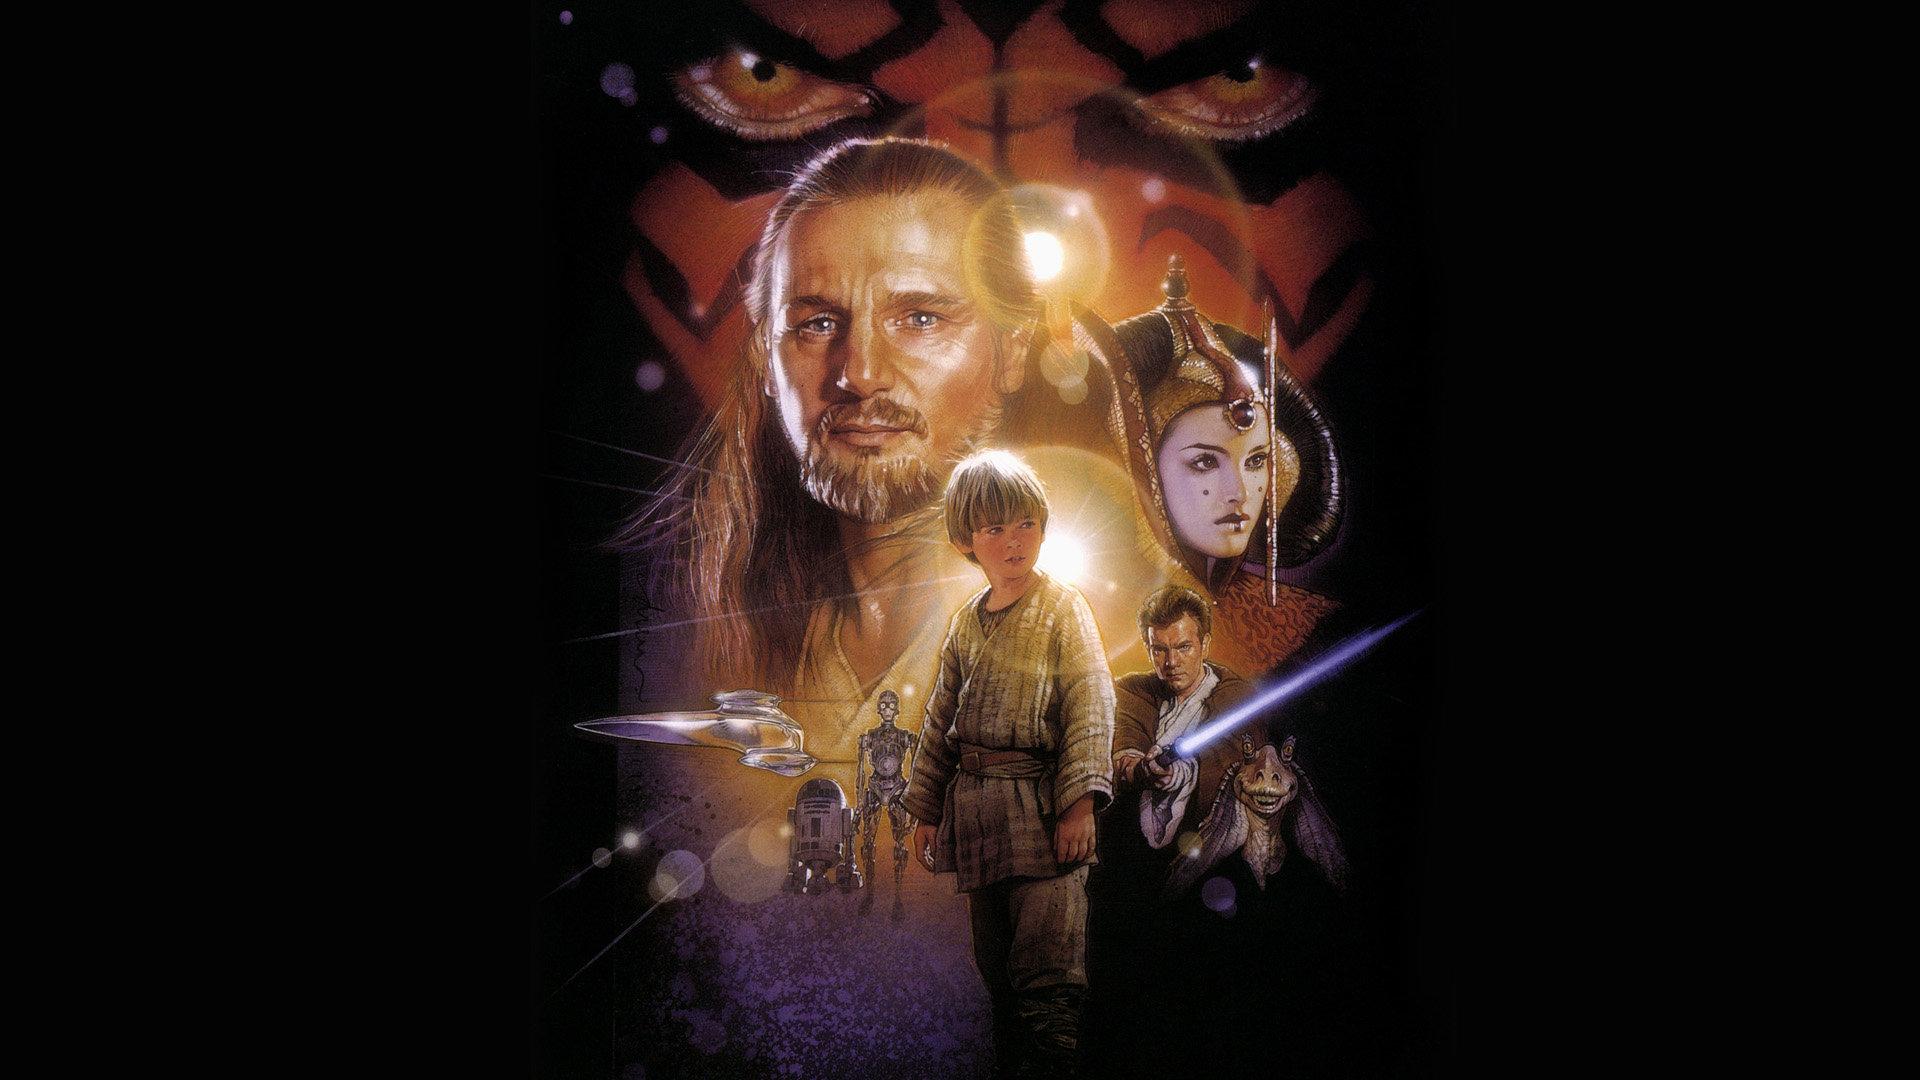 Anakin Skywalker Wallpapers 1920x1080 Full Hd 1080p Desktop Backgrounds